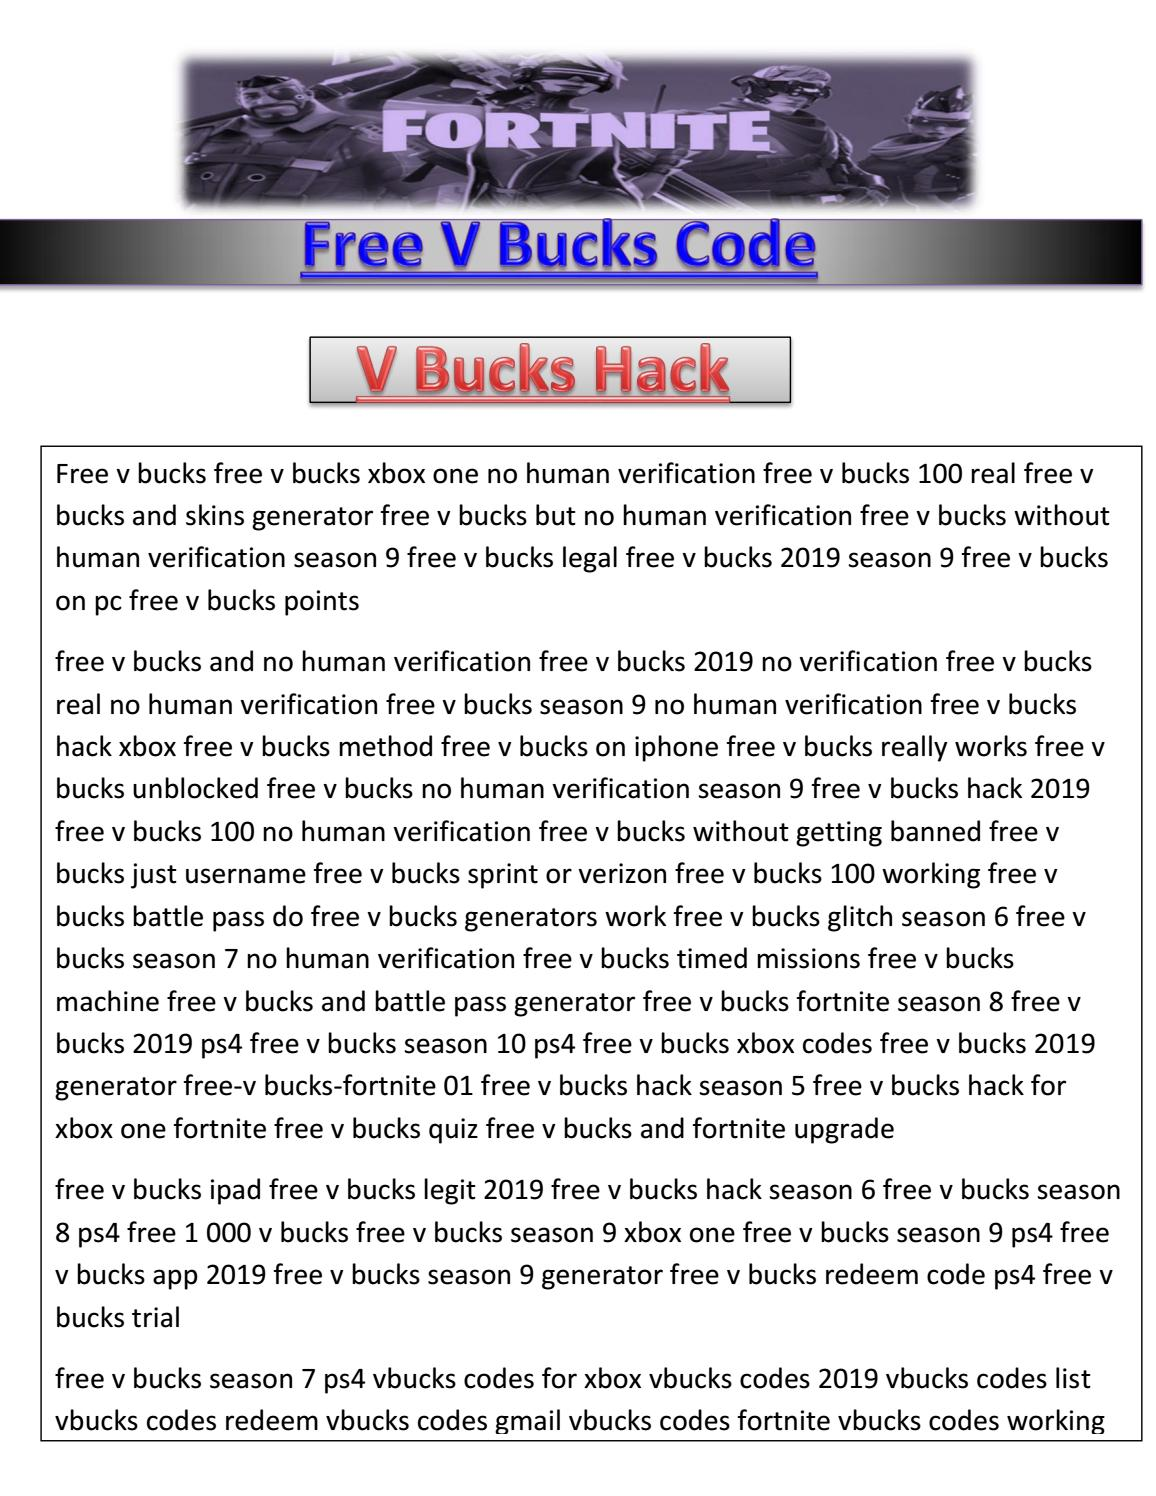 Fortnite Redeem V Bucks Code Pdf Get Easy Method To Get Fortnite Free V Bucks Code 2019 Instant Free V Bucks Life Time By Sonarsandwip Issuu